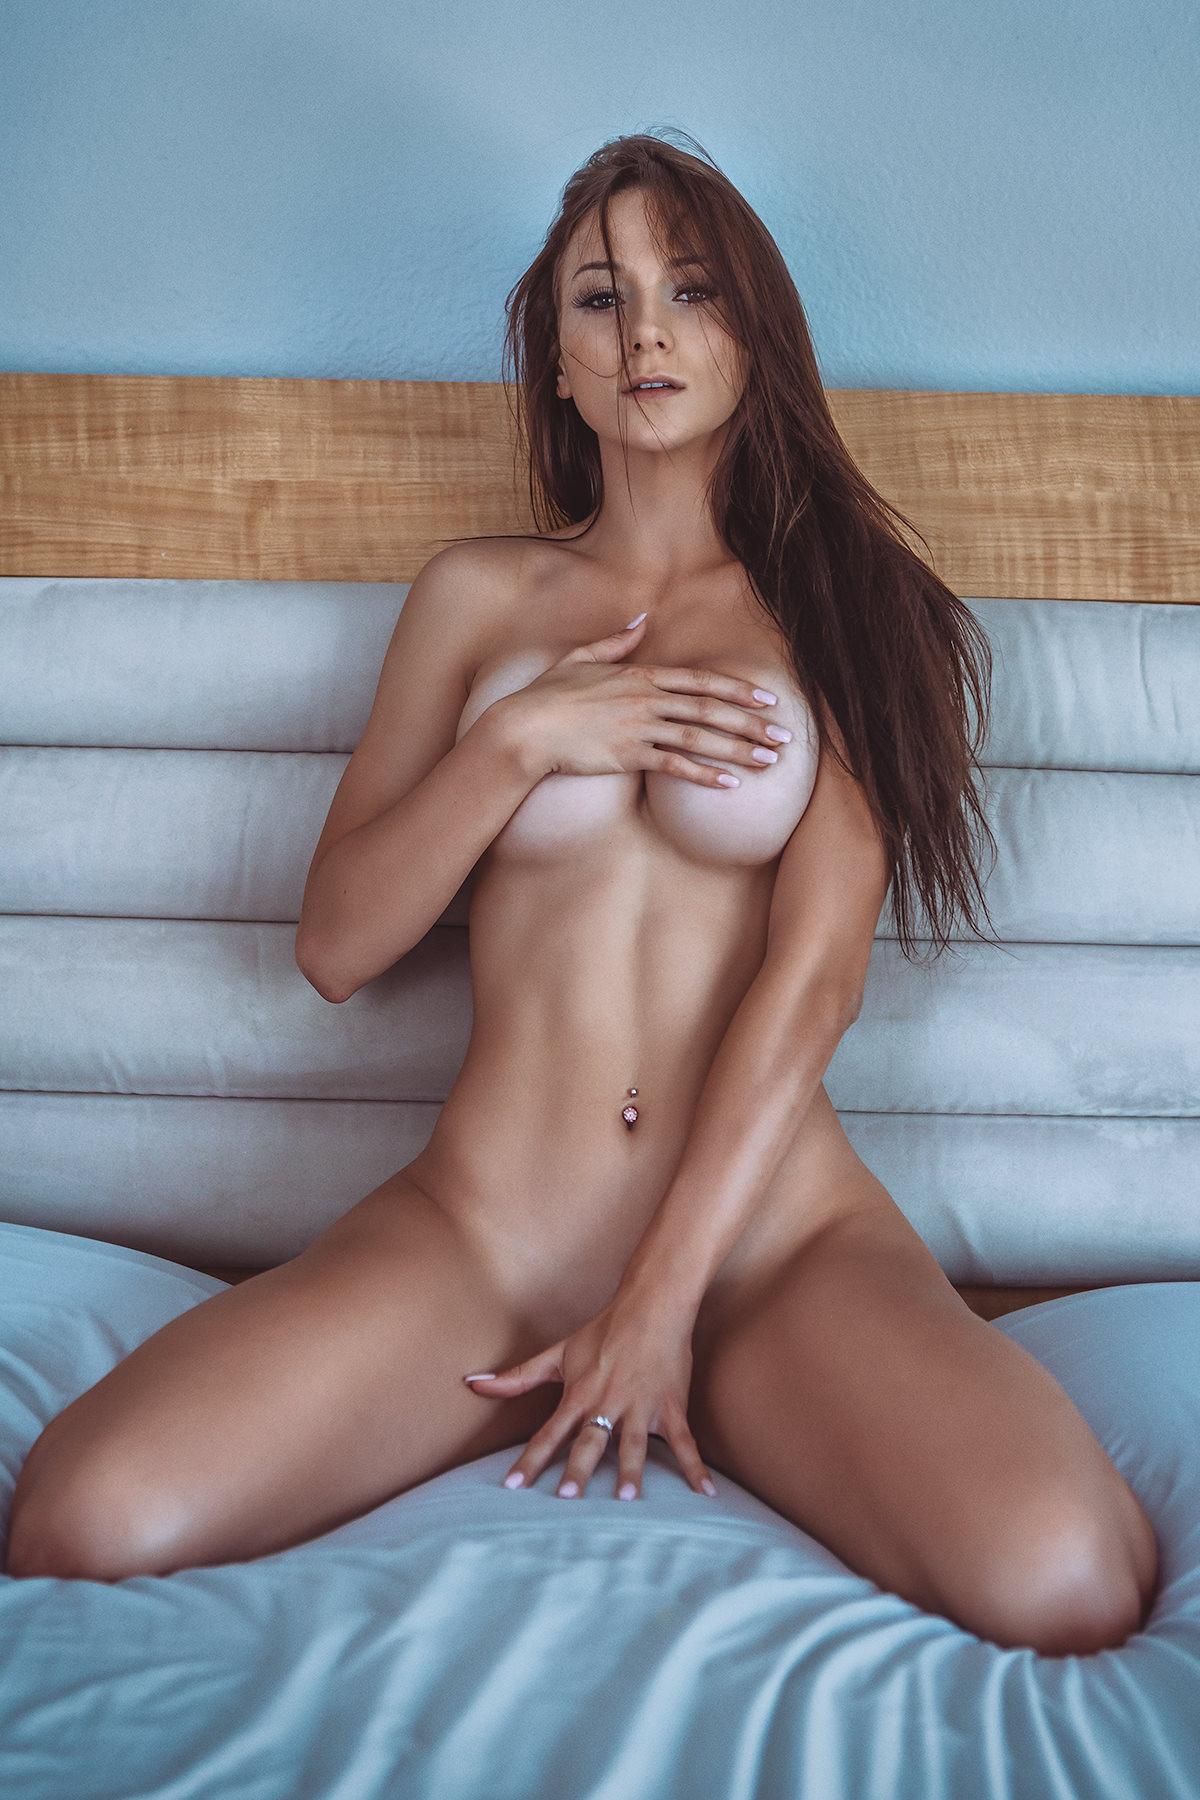 nude photographer massachusetts jpg 1080x810